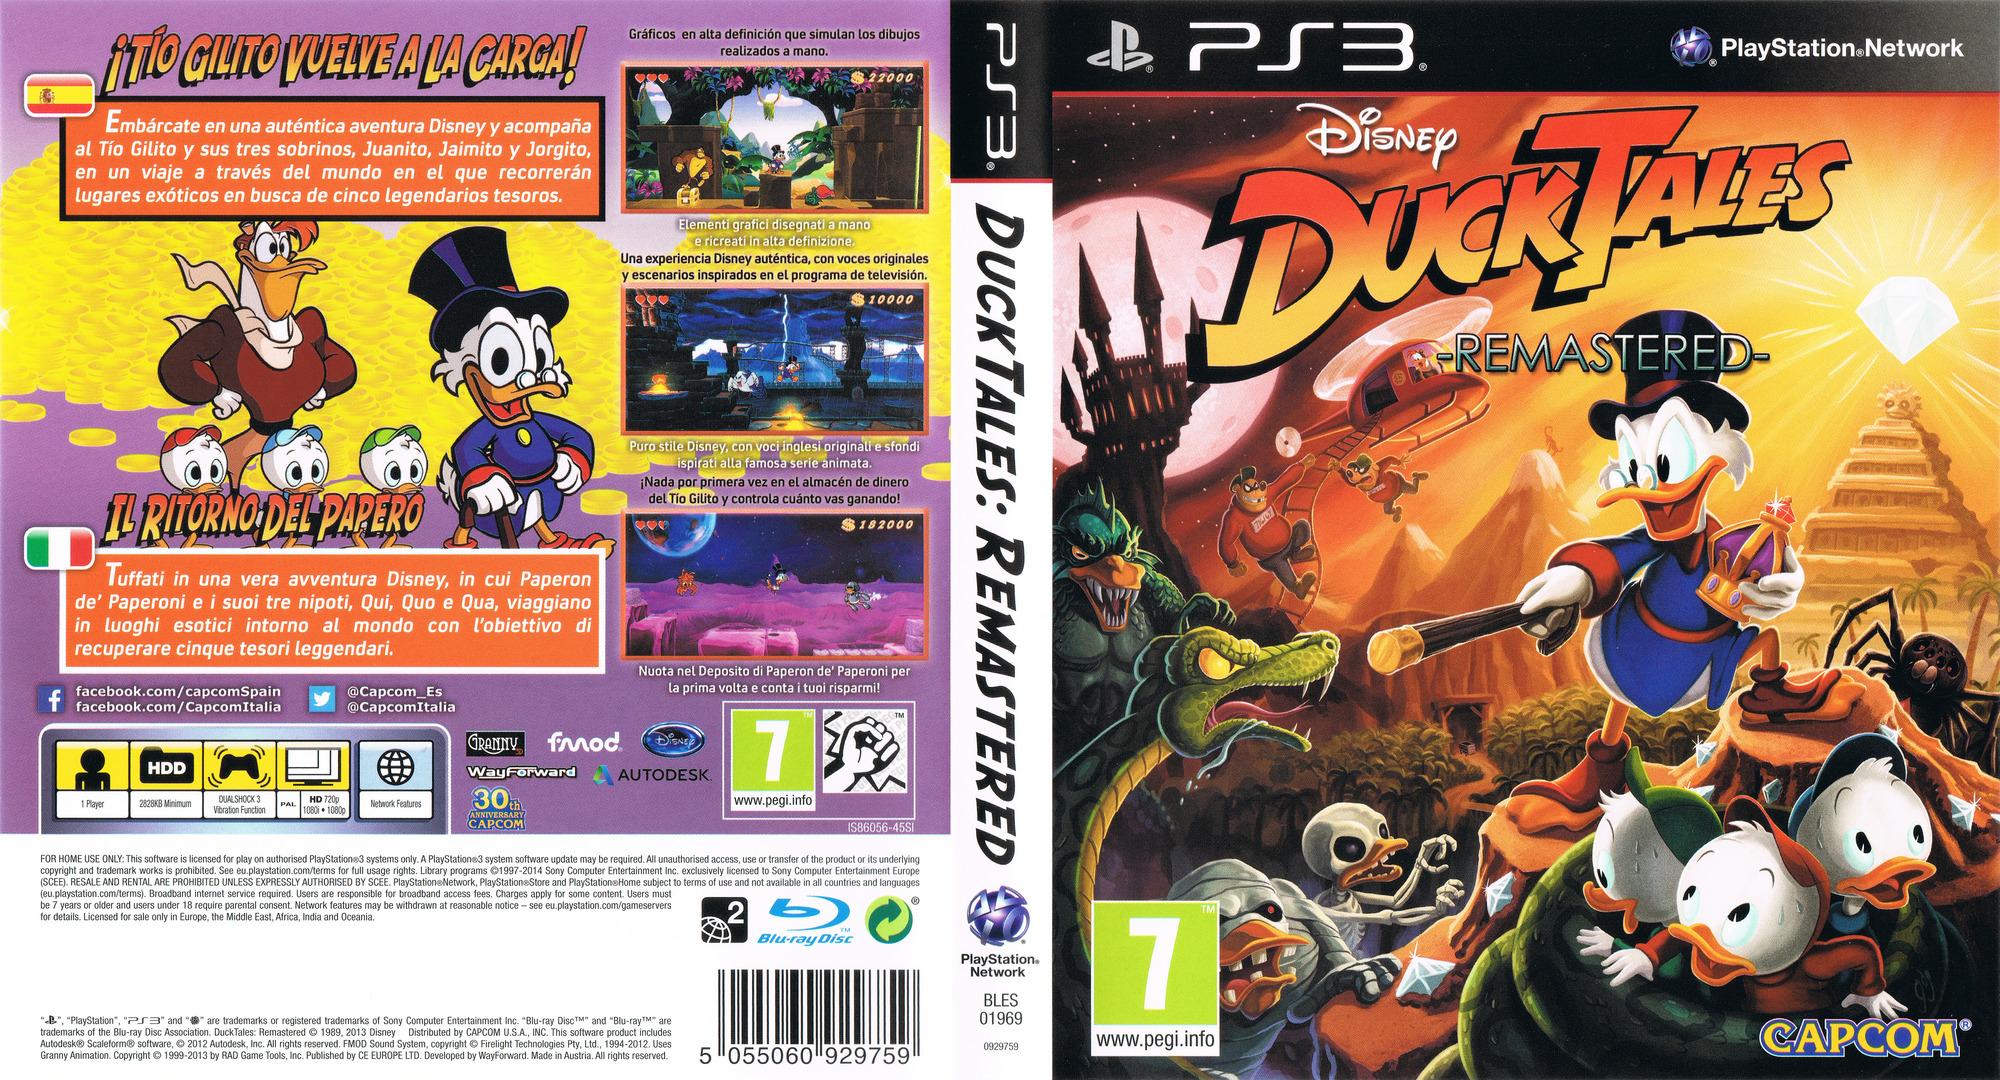 BLES01969 - DuckTales: Remastered